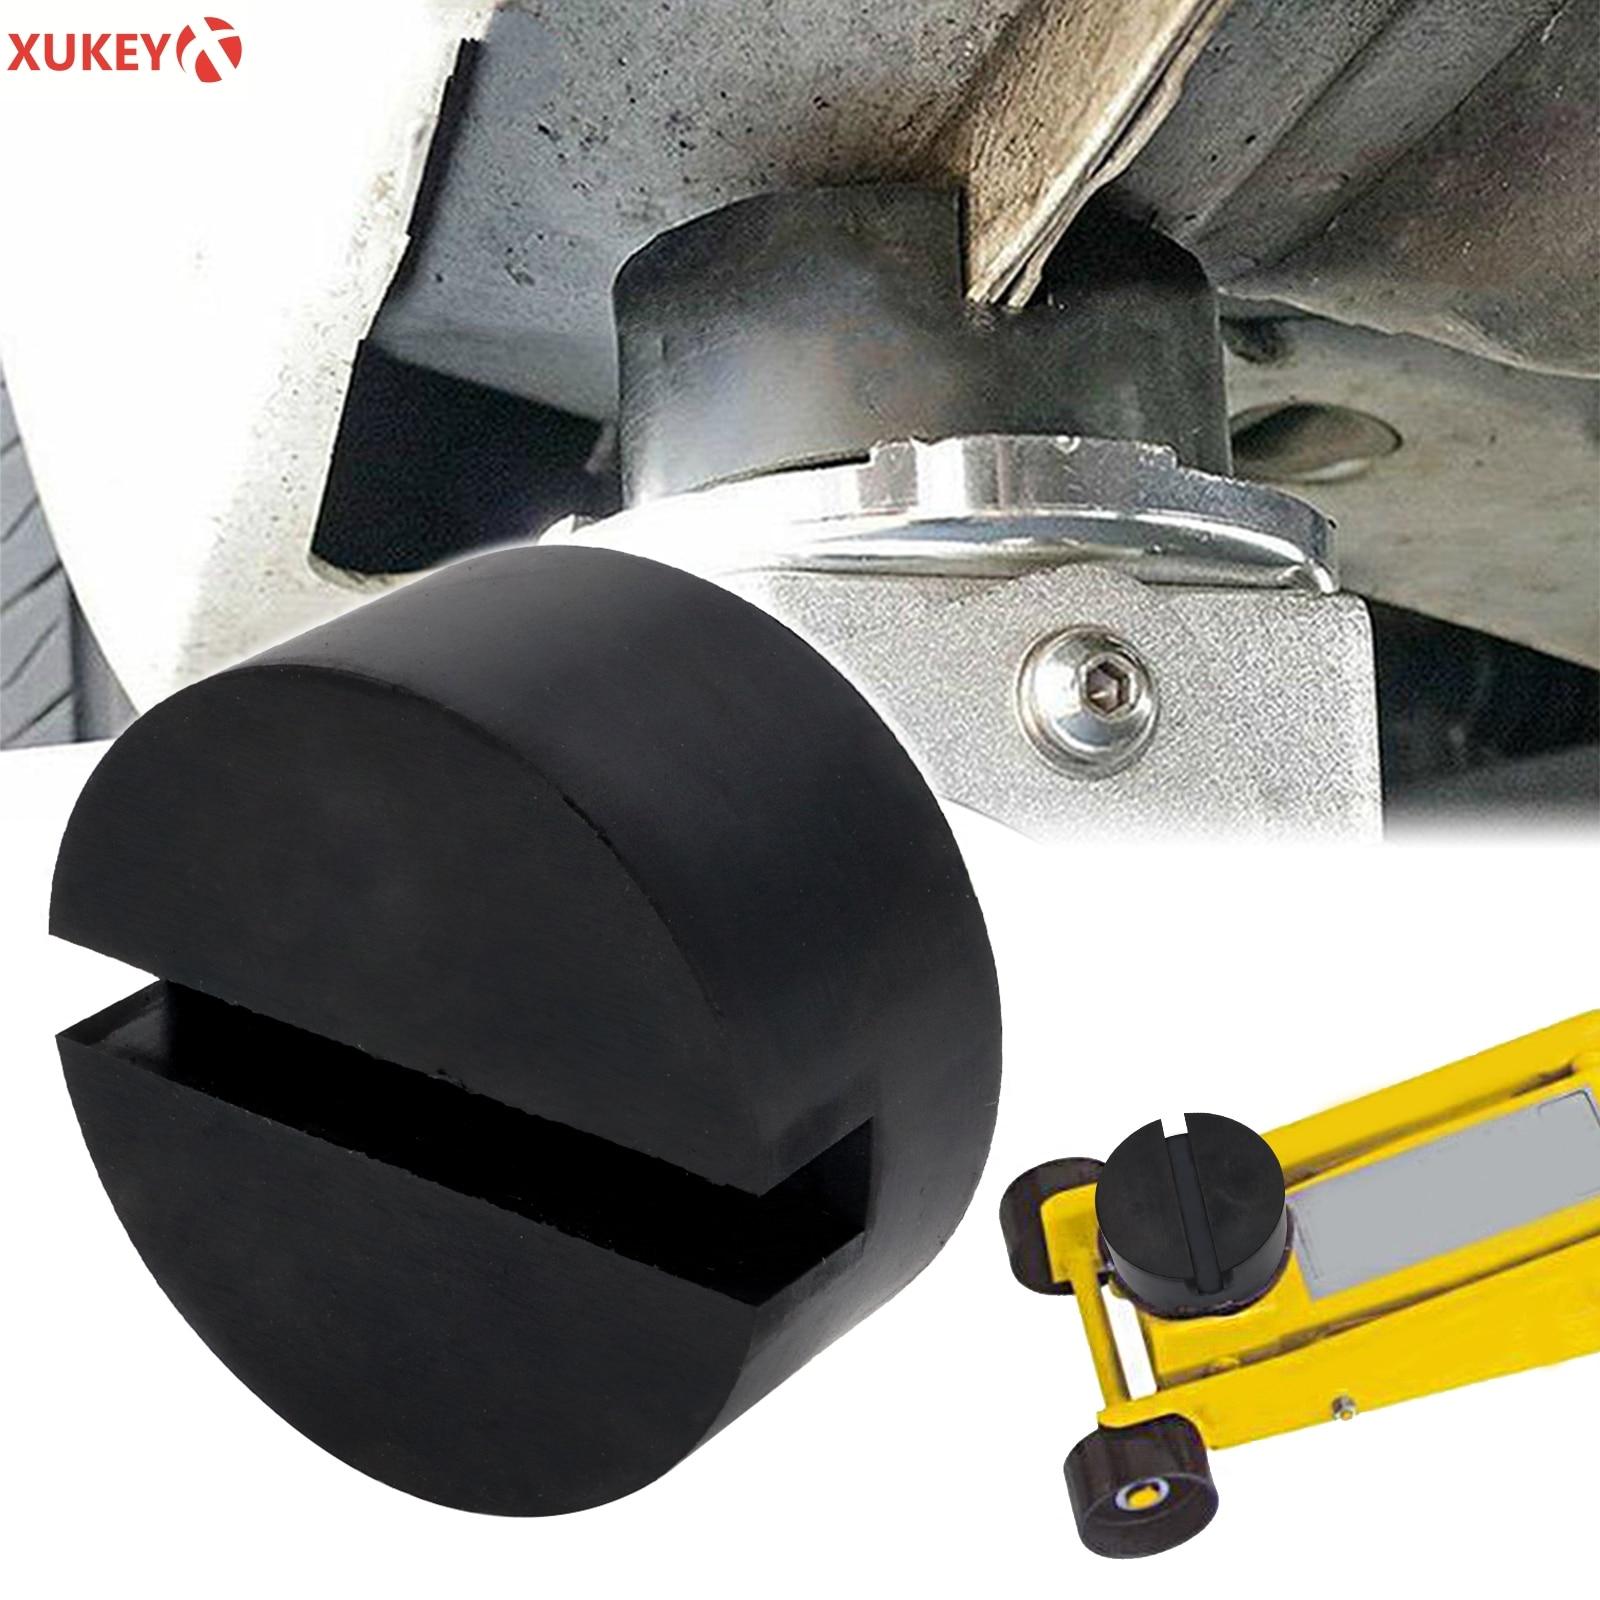 Jack Rubber Pad Anti-slip Rail Adapter Support Block Heavy Duty Car Lift Tool Accessories For Honda Toyota Nissan Hyundai Mazda